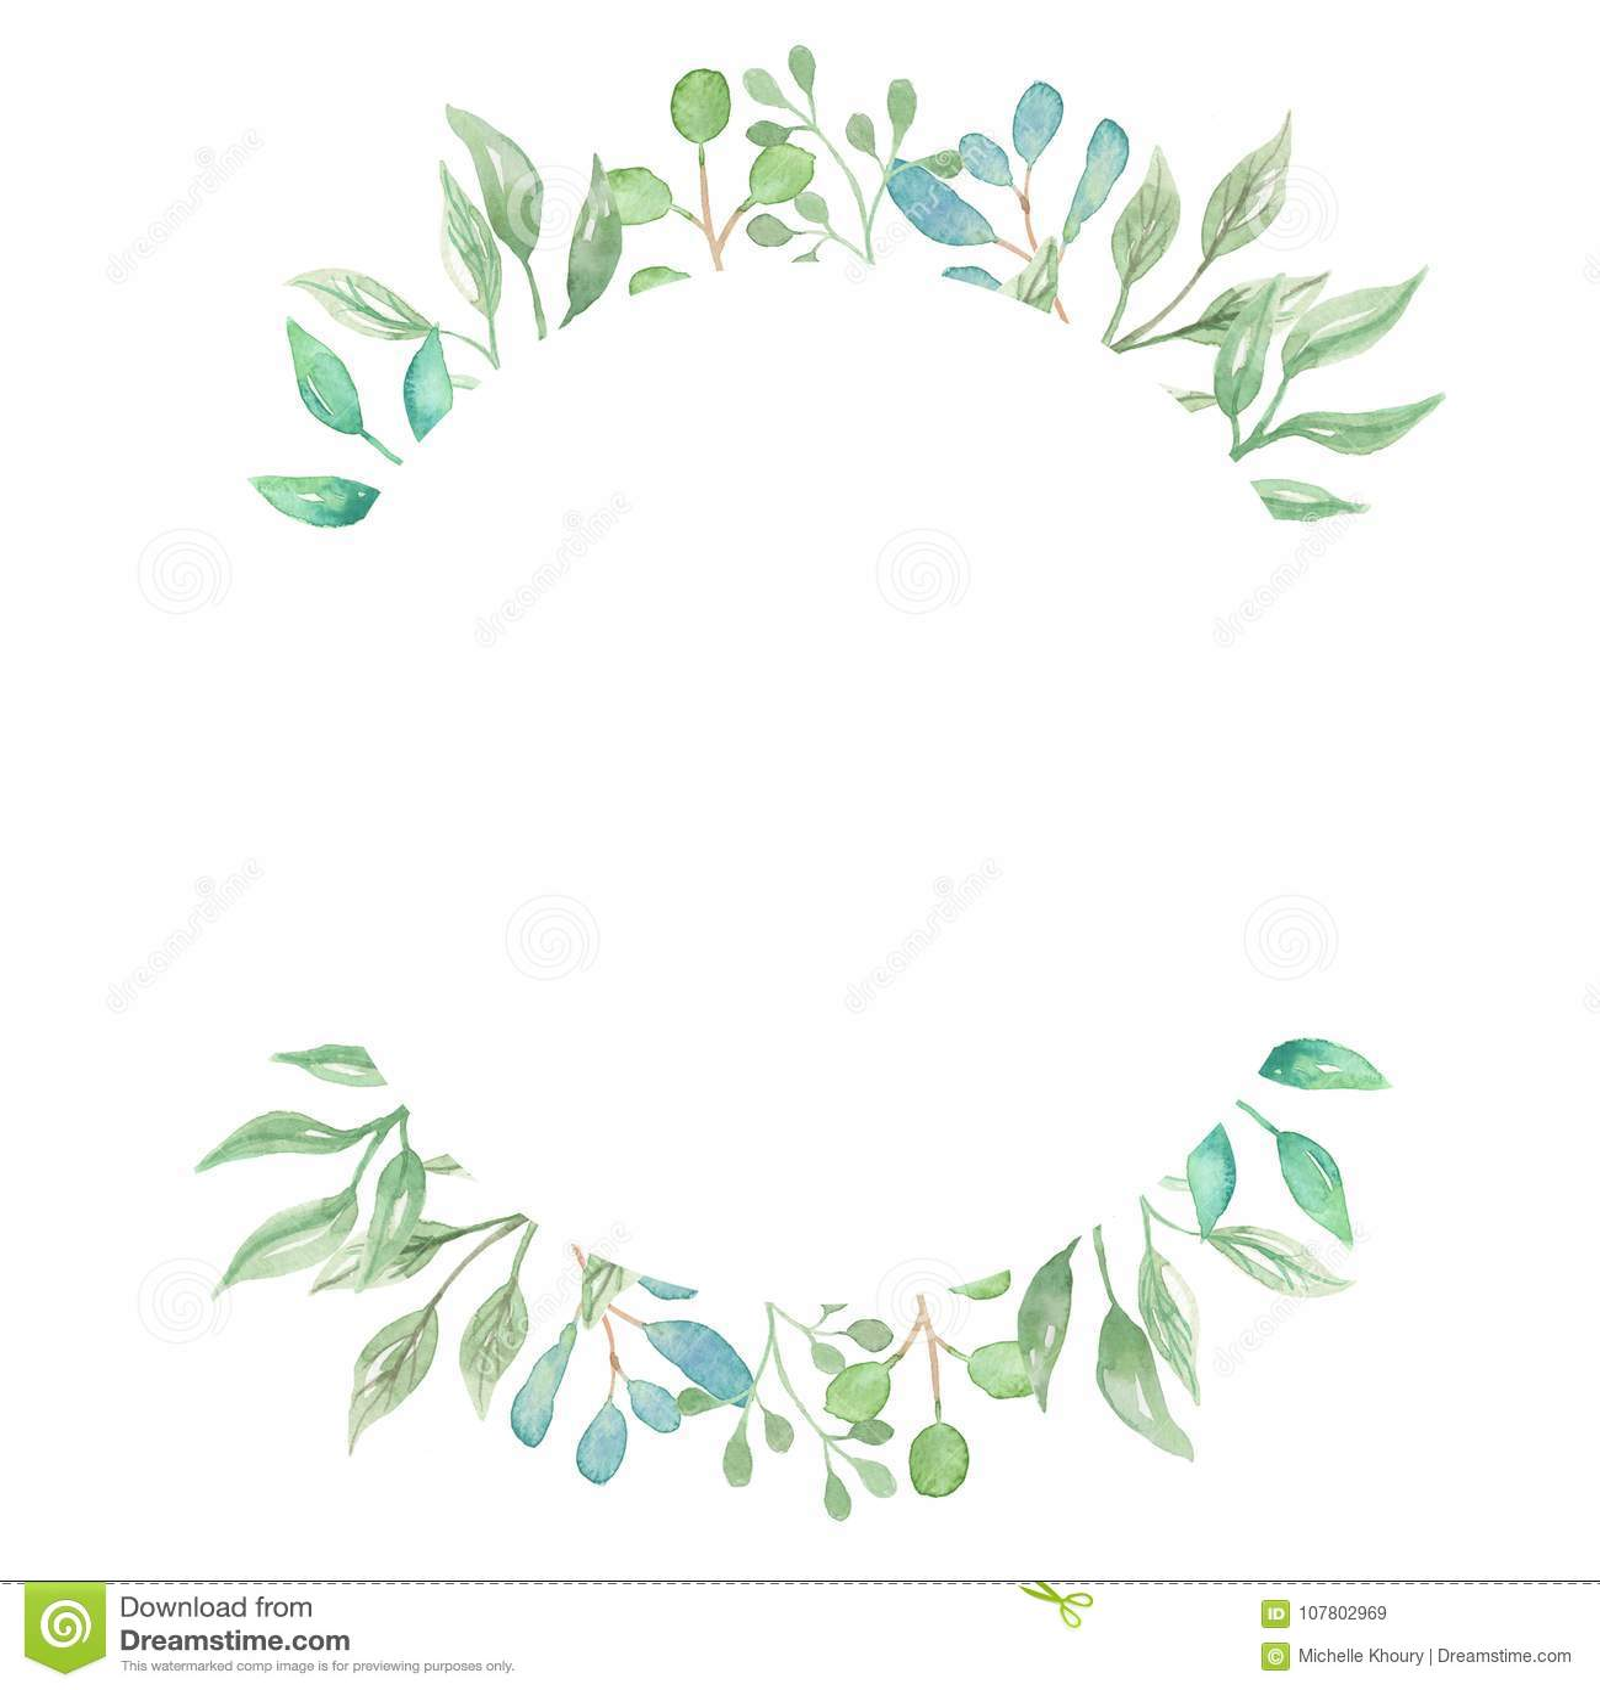 431476f2bac9 Royalty-Free Stock Photo. Watercolor Border Greenery Foliage Leaves Leaf  Green Frame Wedding Spring Summer